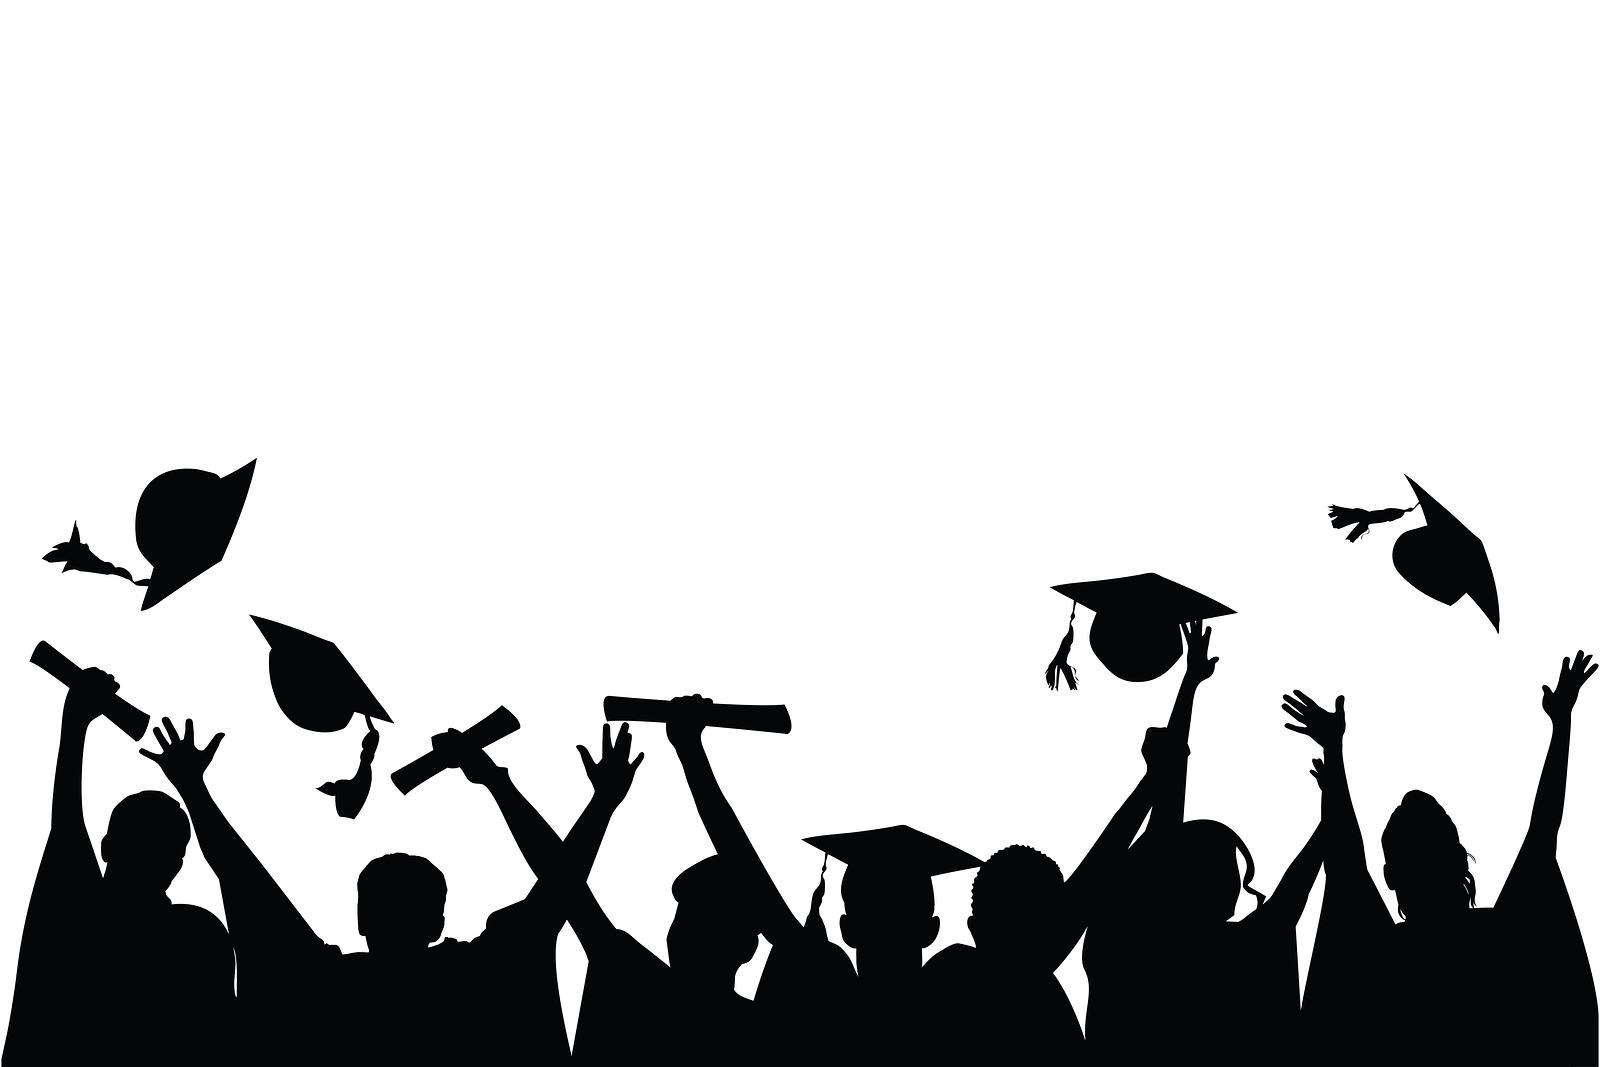 Shadow clipart graduation #13